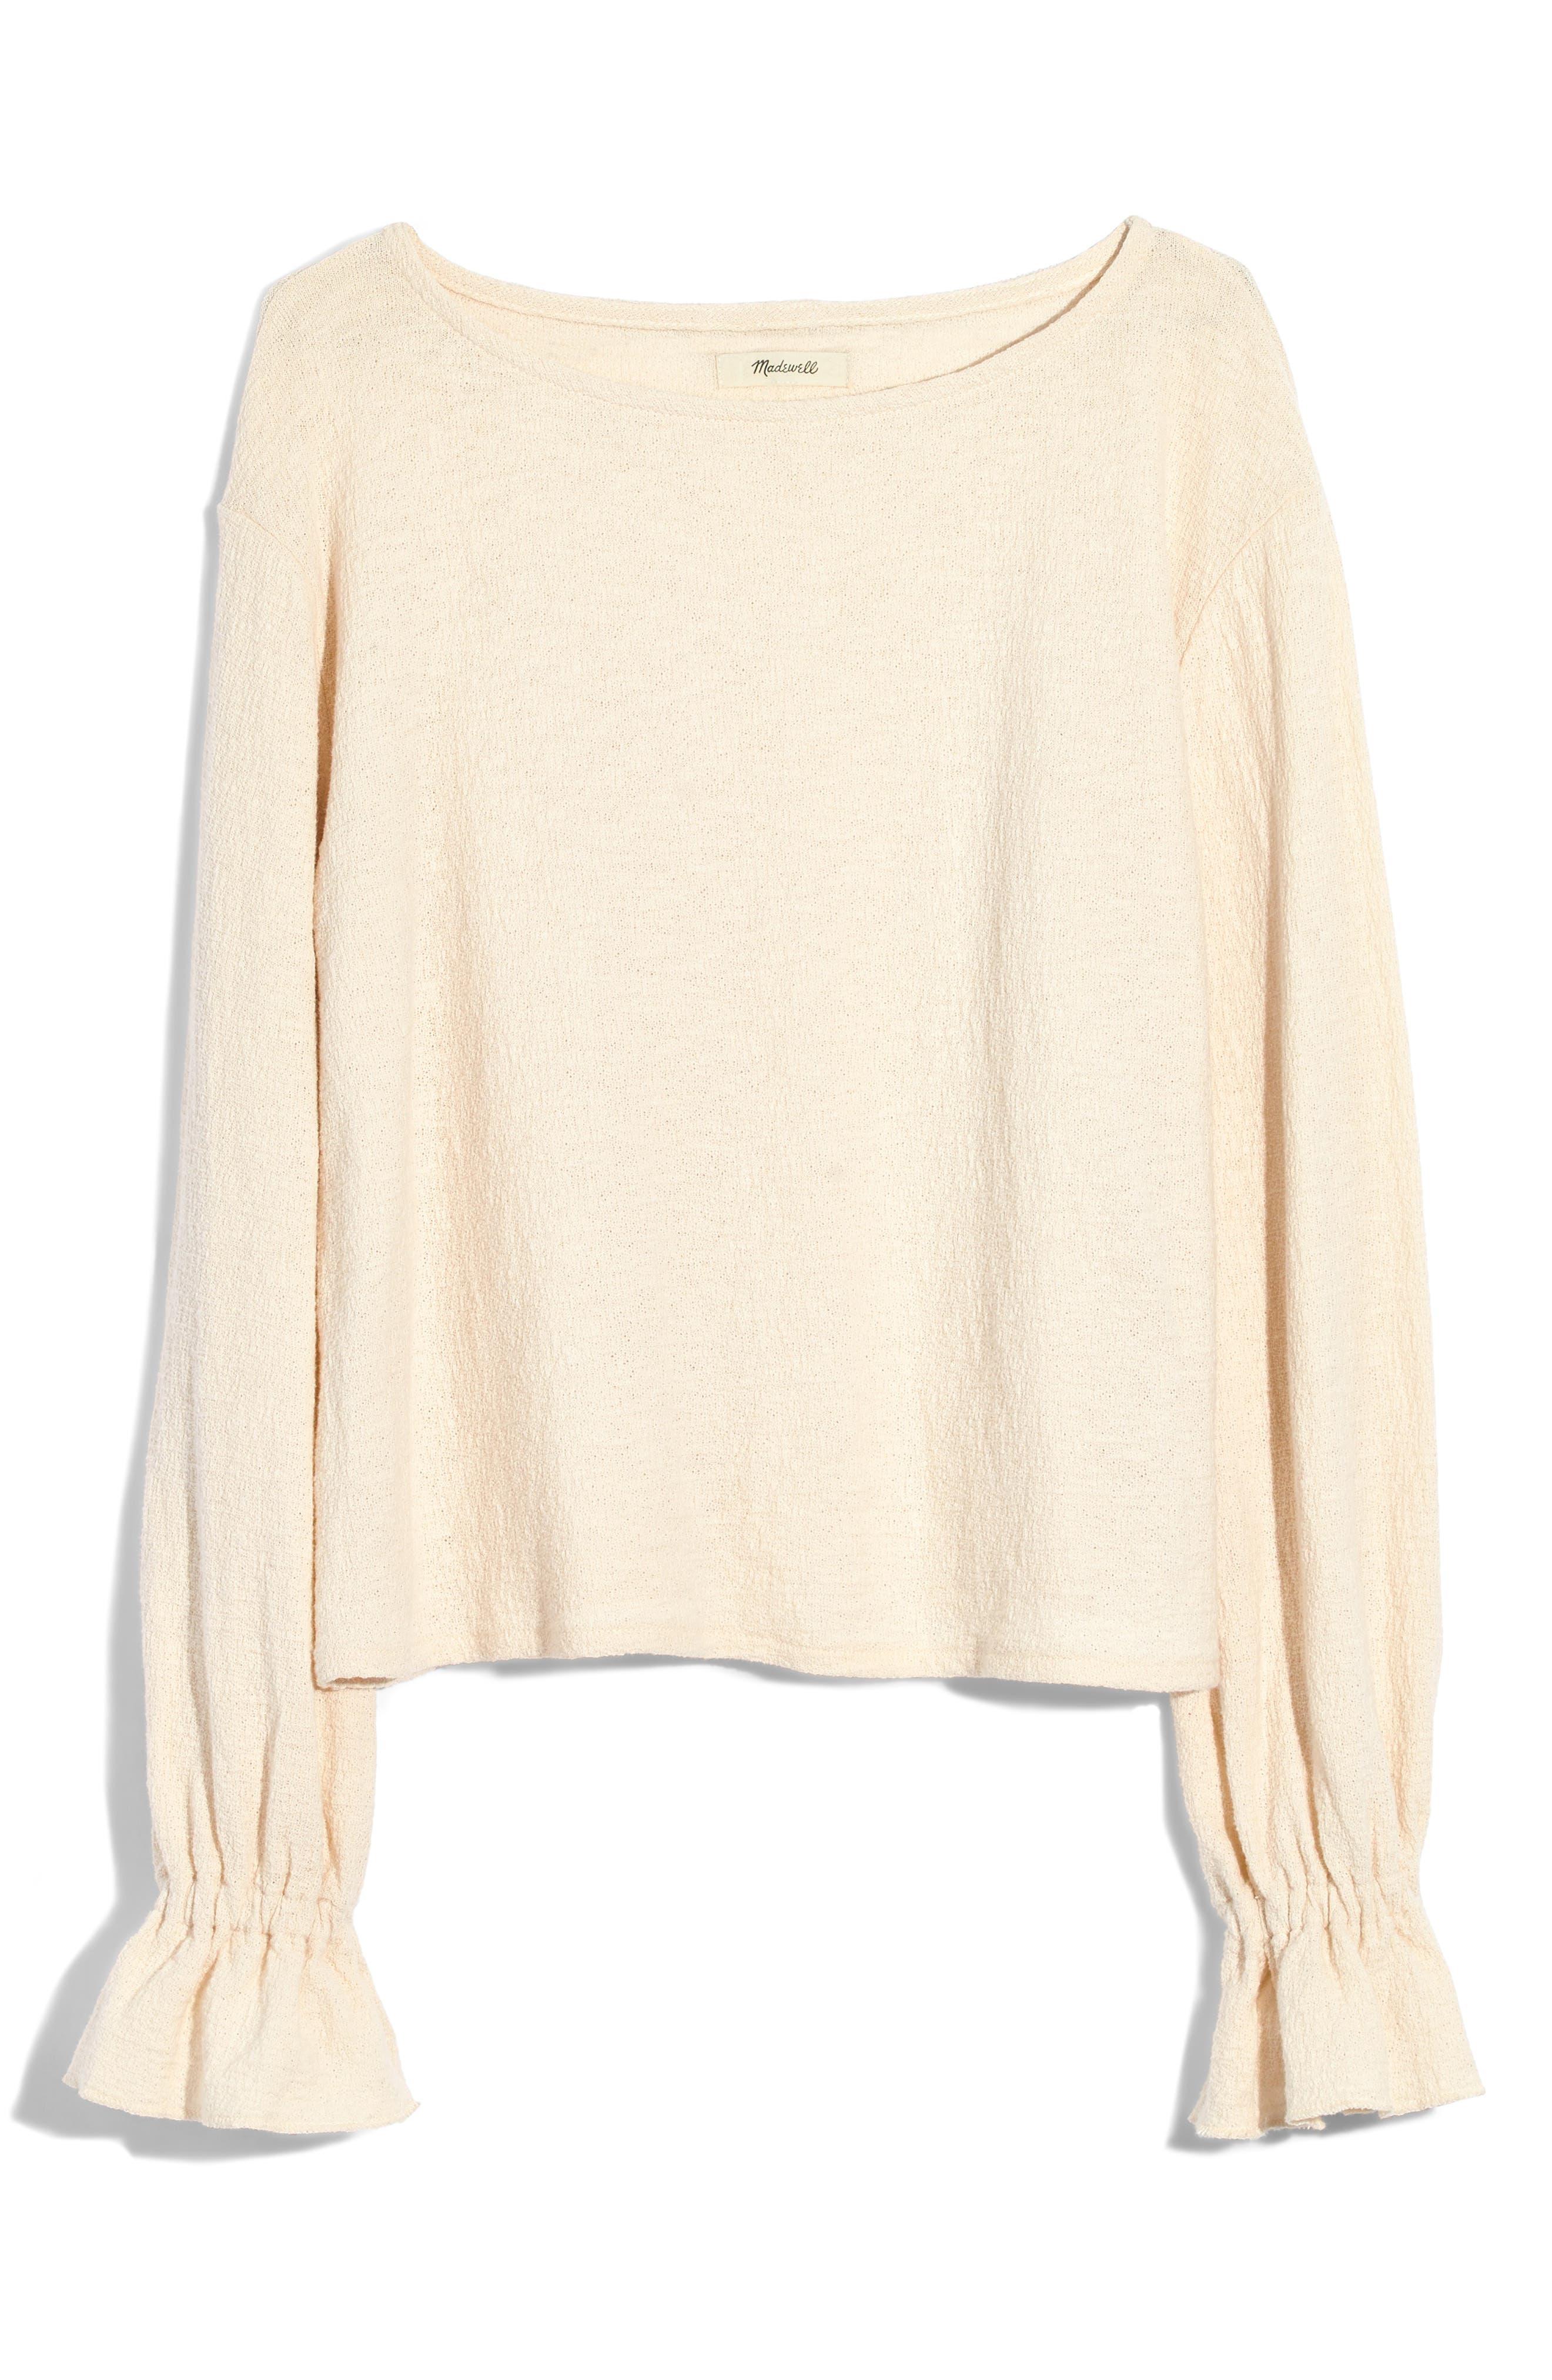 Texture & Thread Ruffle Cuff Top, Main, color, BLEACHED LINEN